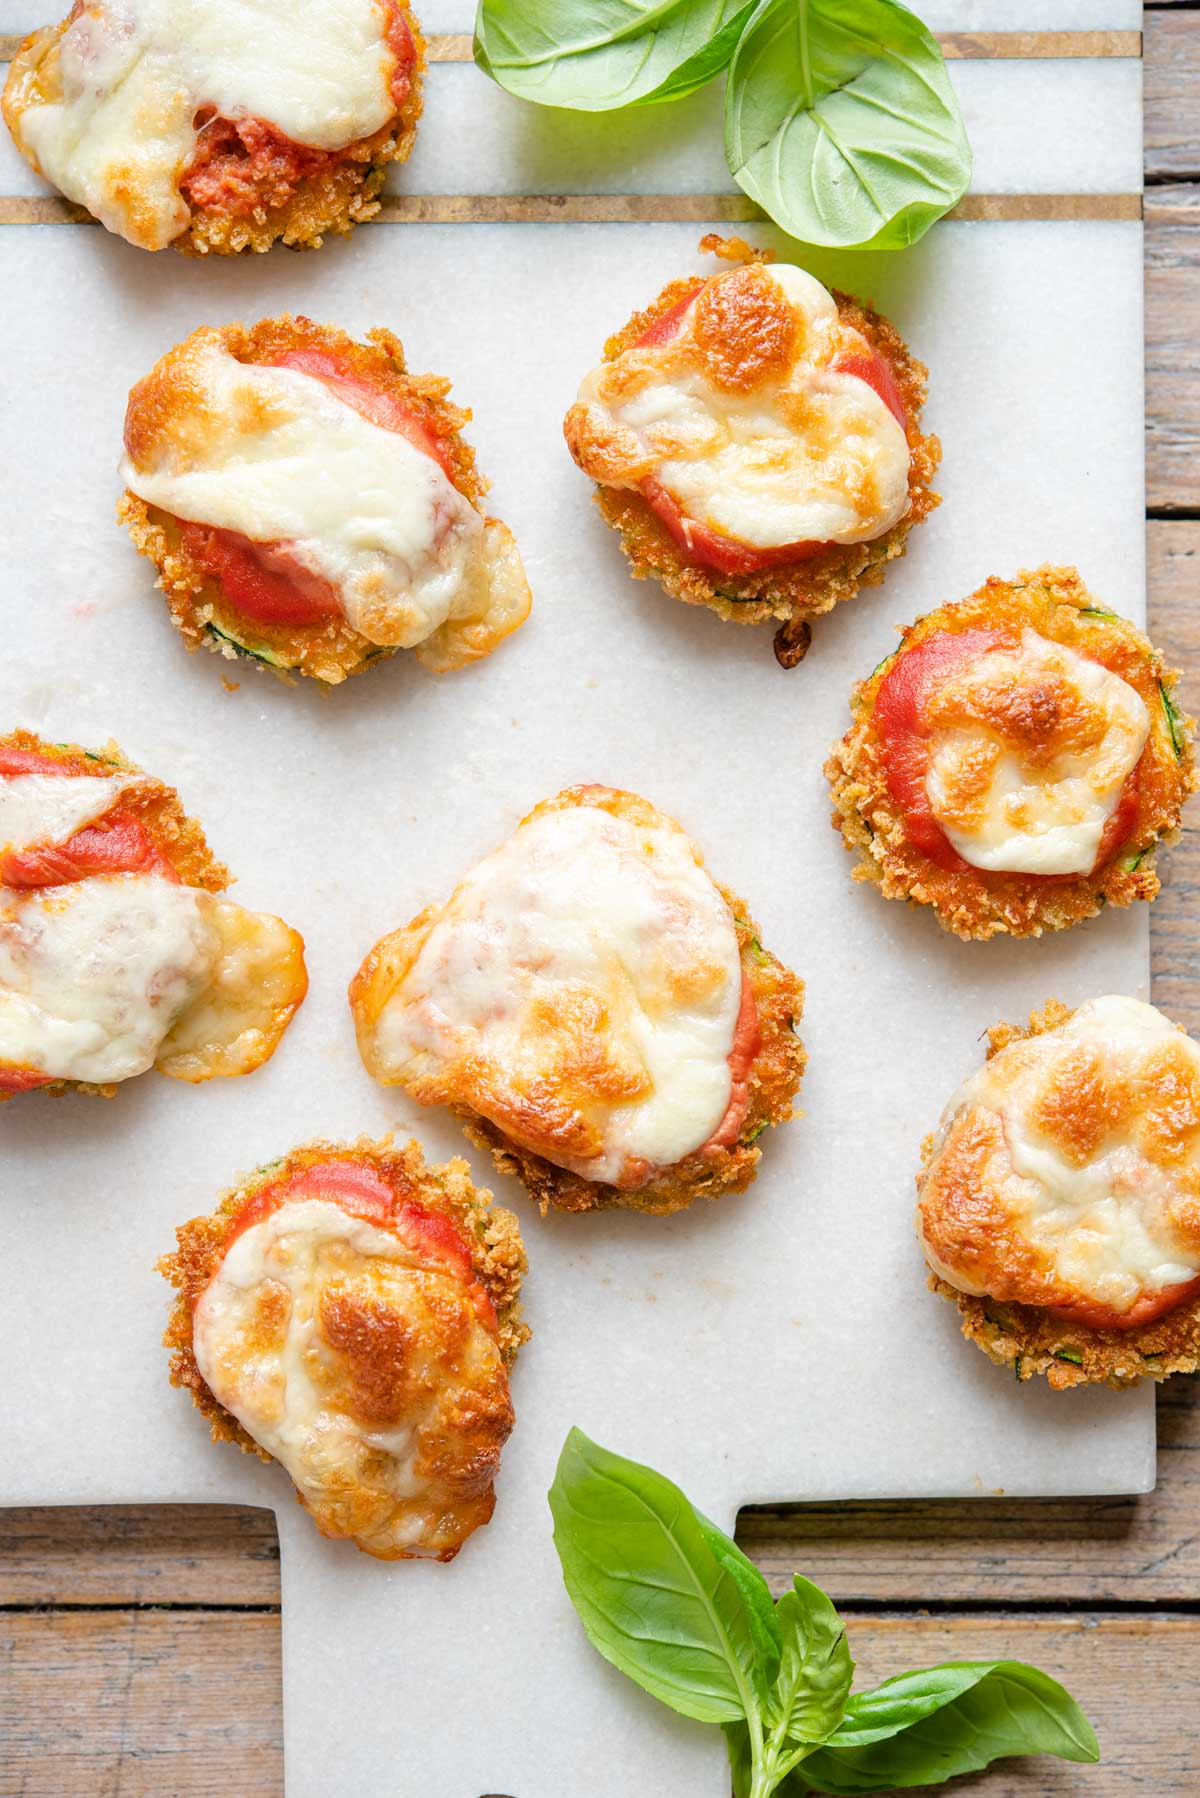 Fried Zucchini Pizza Bites